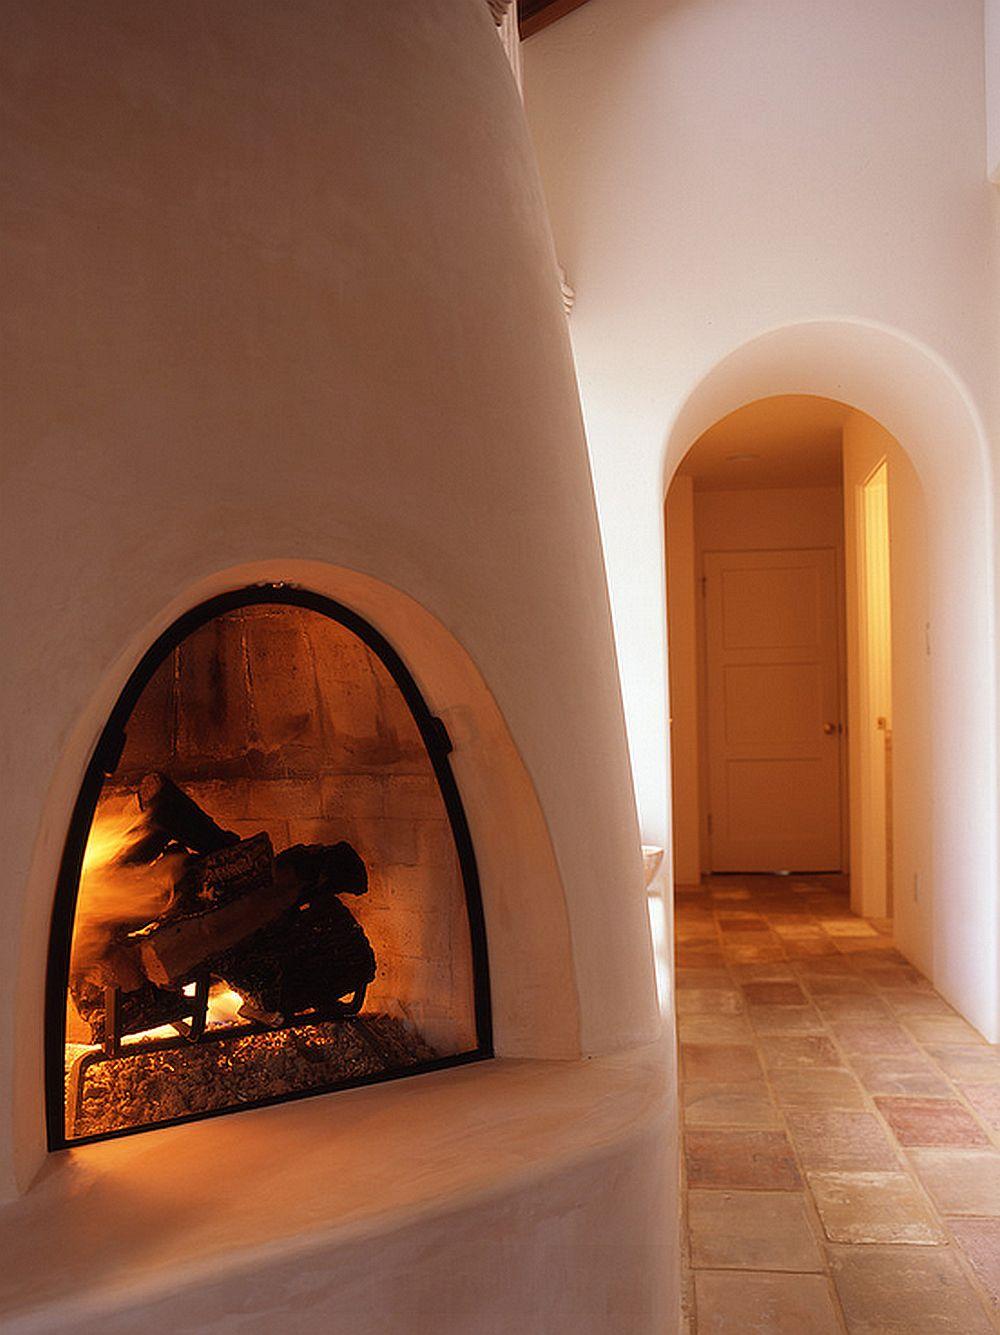 adelaparvu.com despre atelier de artist, Menlo Park, California, soba din lut, design Zak Johnson, Foto Michael Winokur (7)